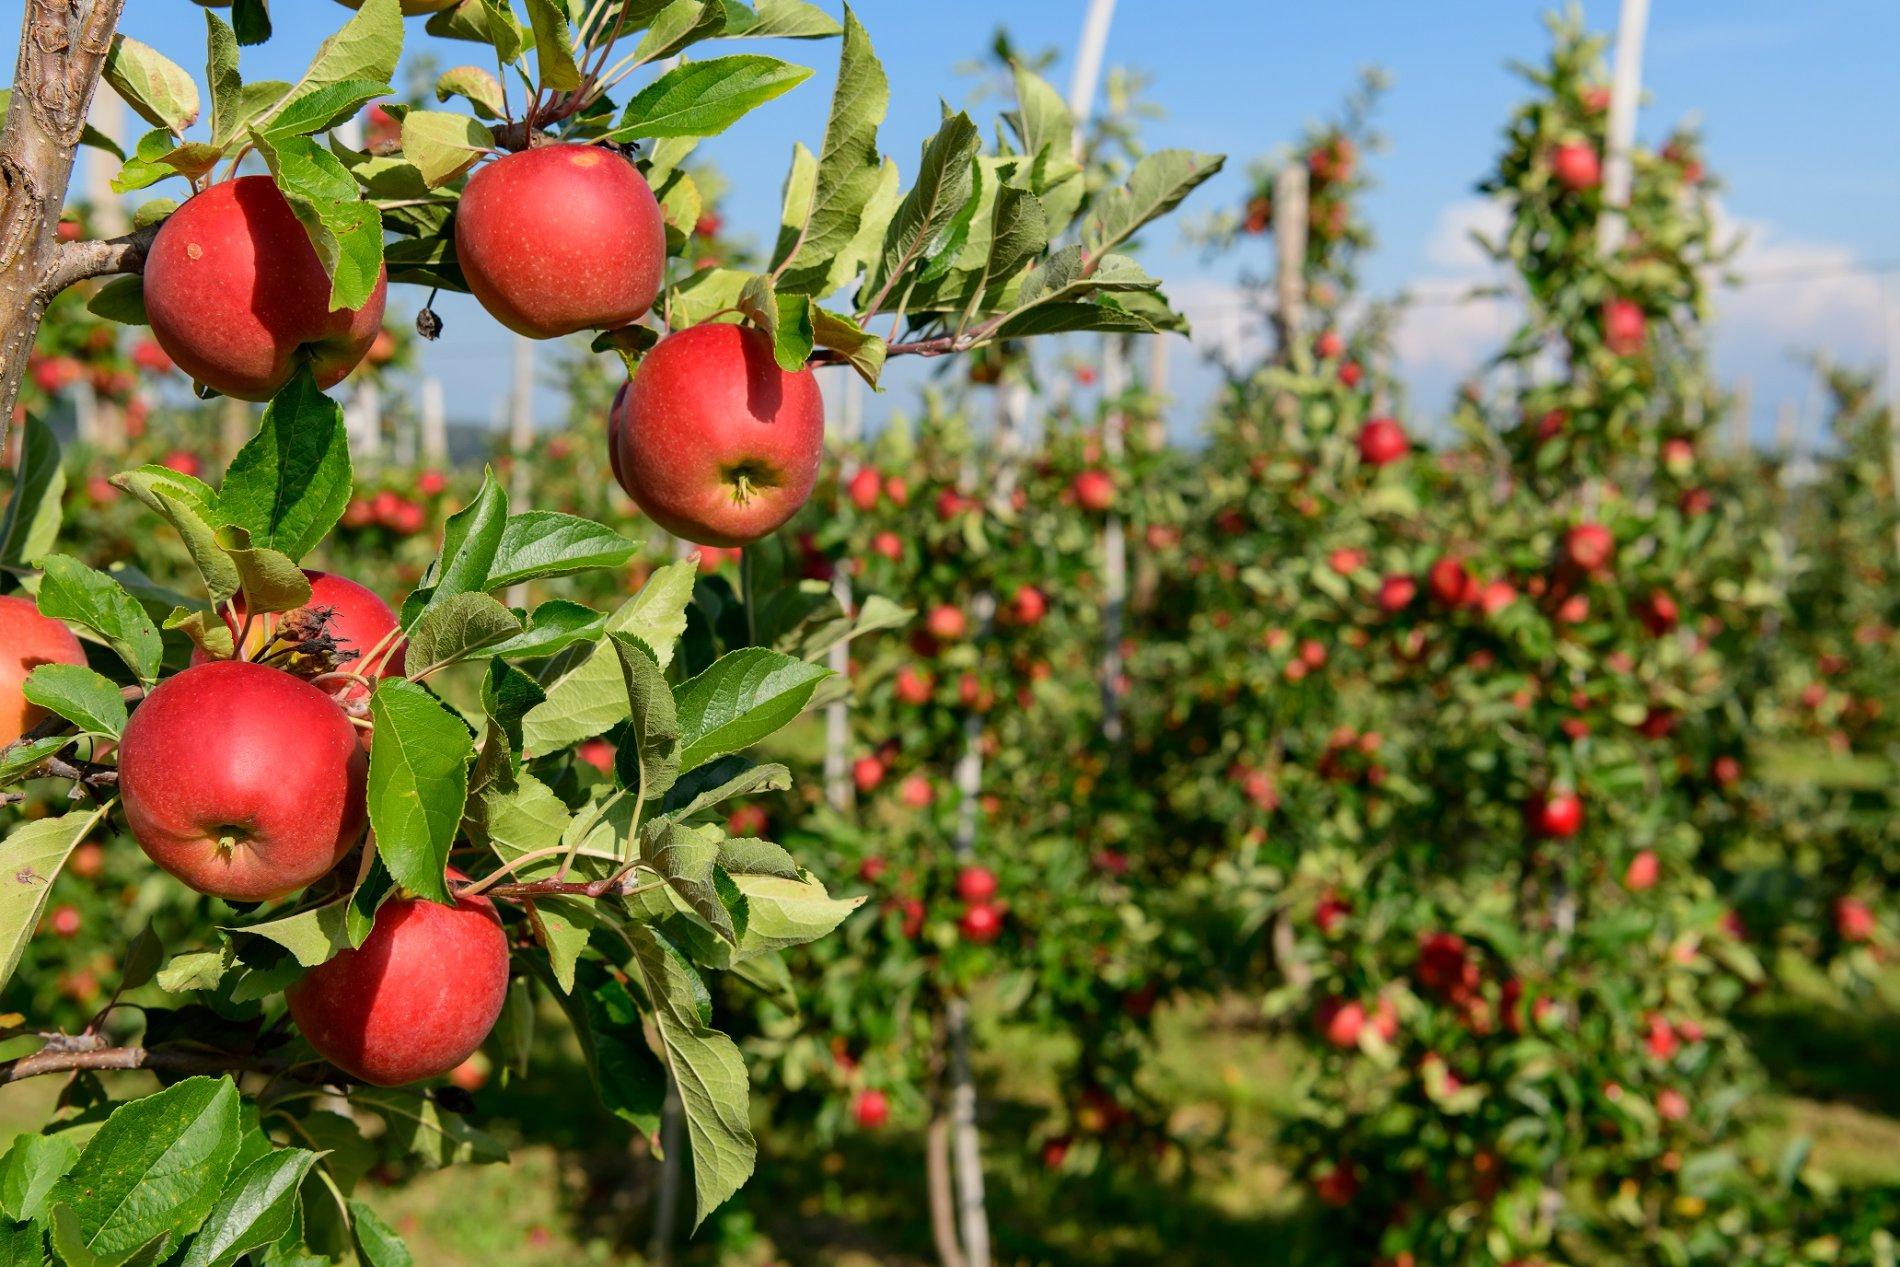 Apfelplantage mit roten Äpfeln